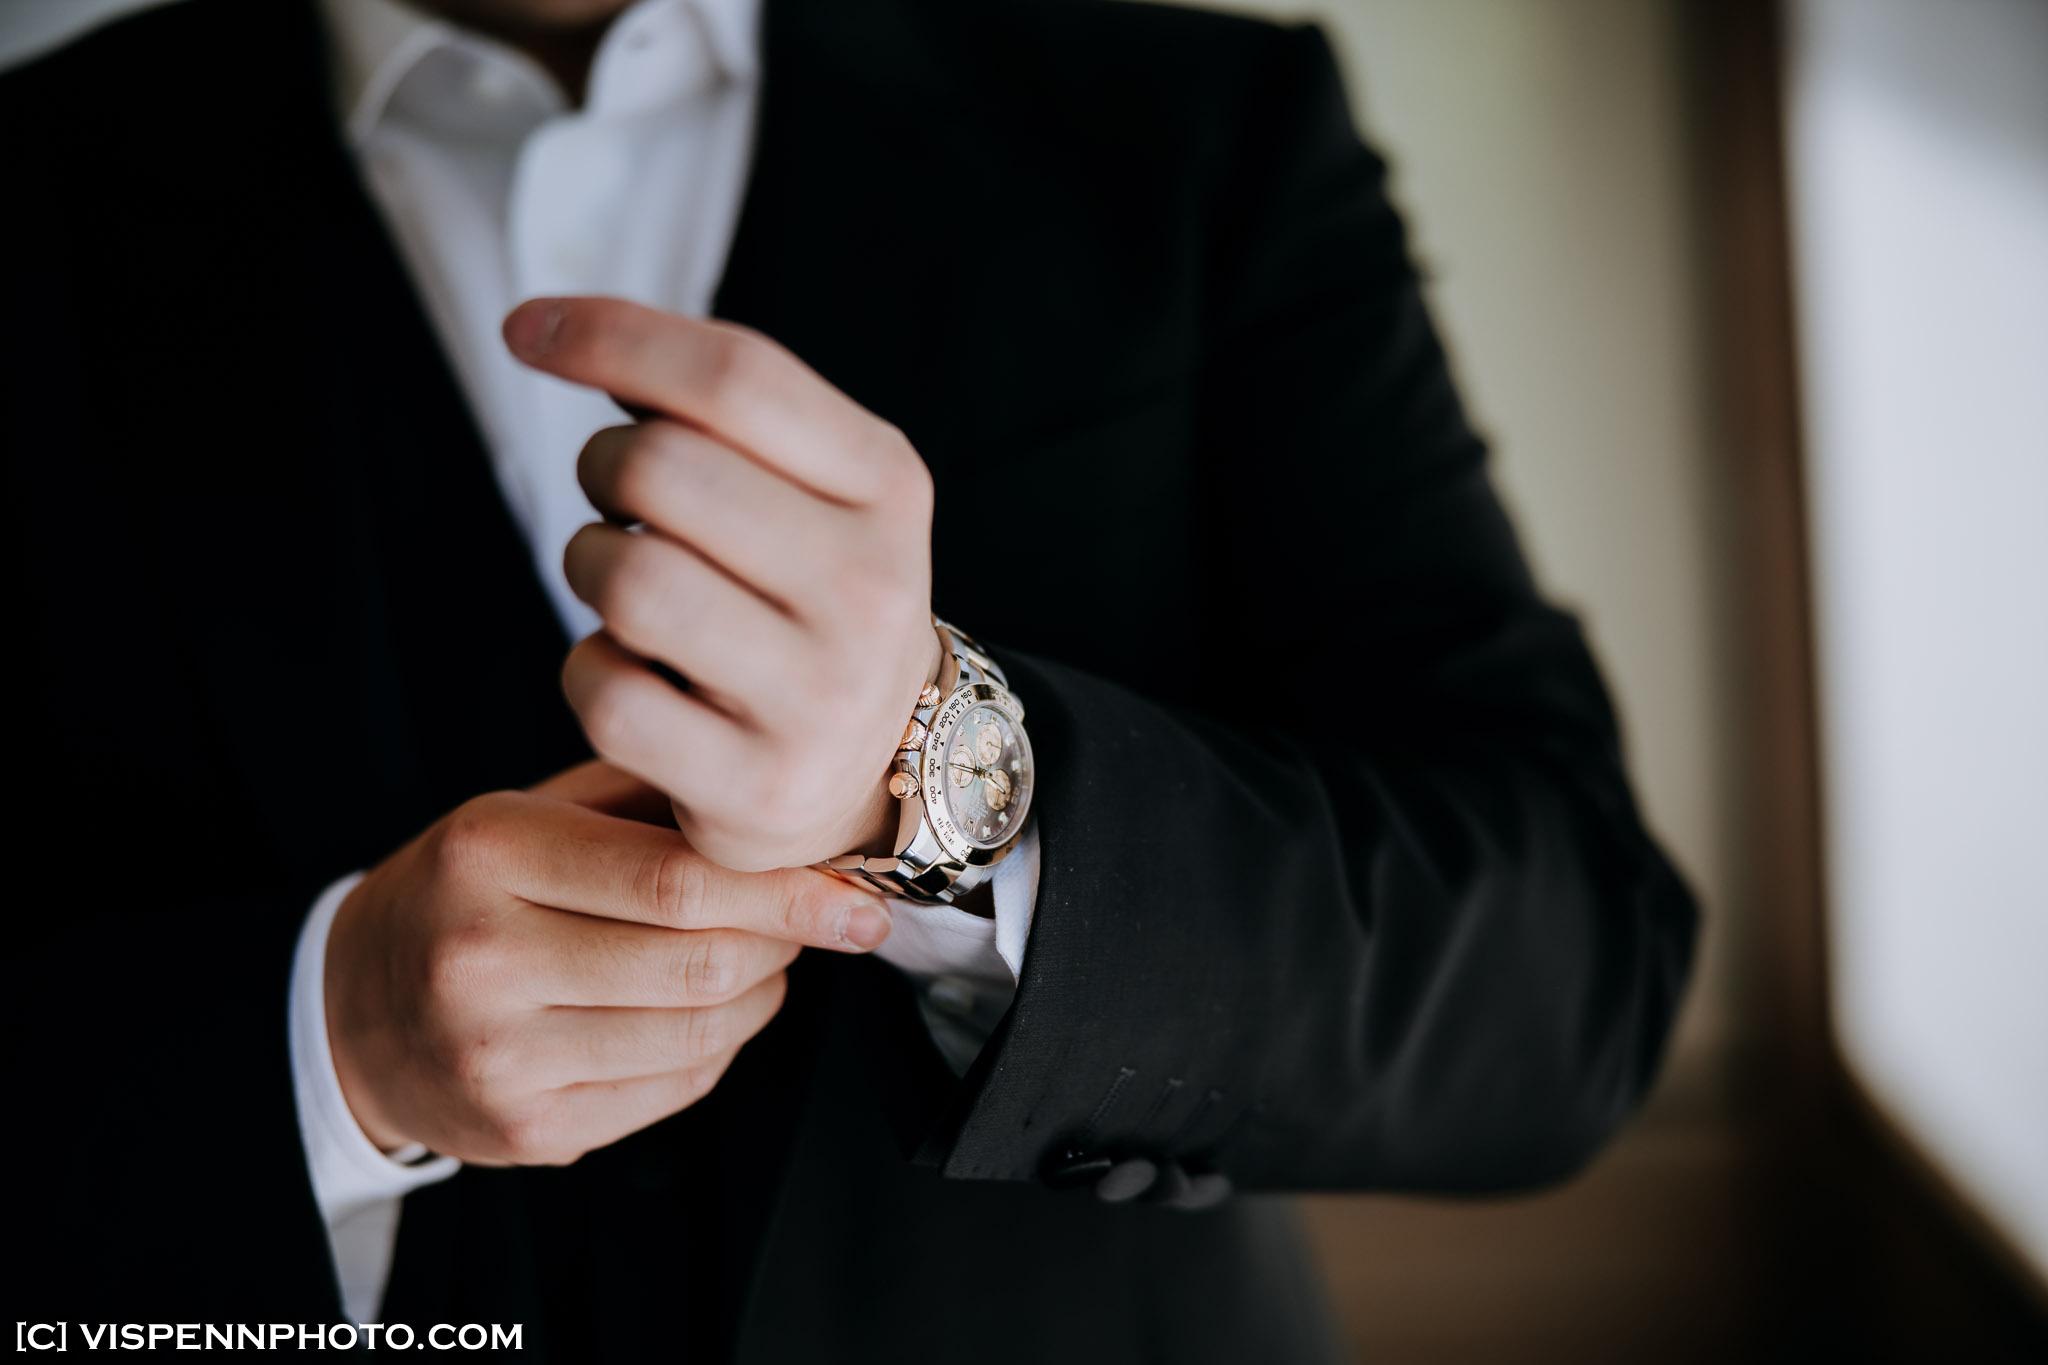 WEDDING DAY Photography Melbourne ElitaPB 04469 1P EOSR ZHPENN